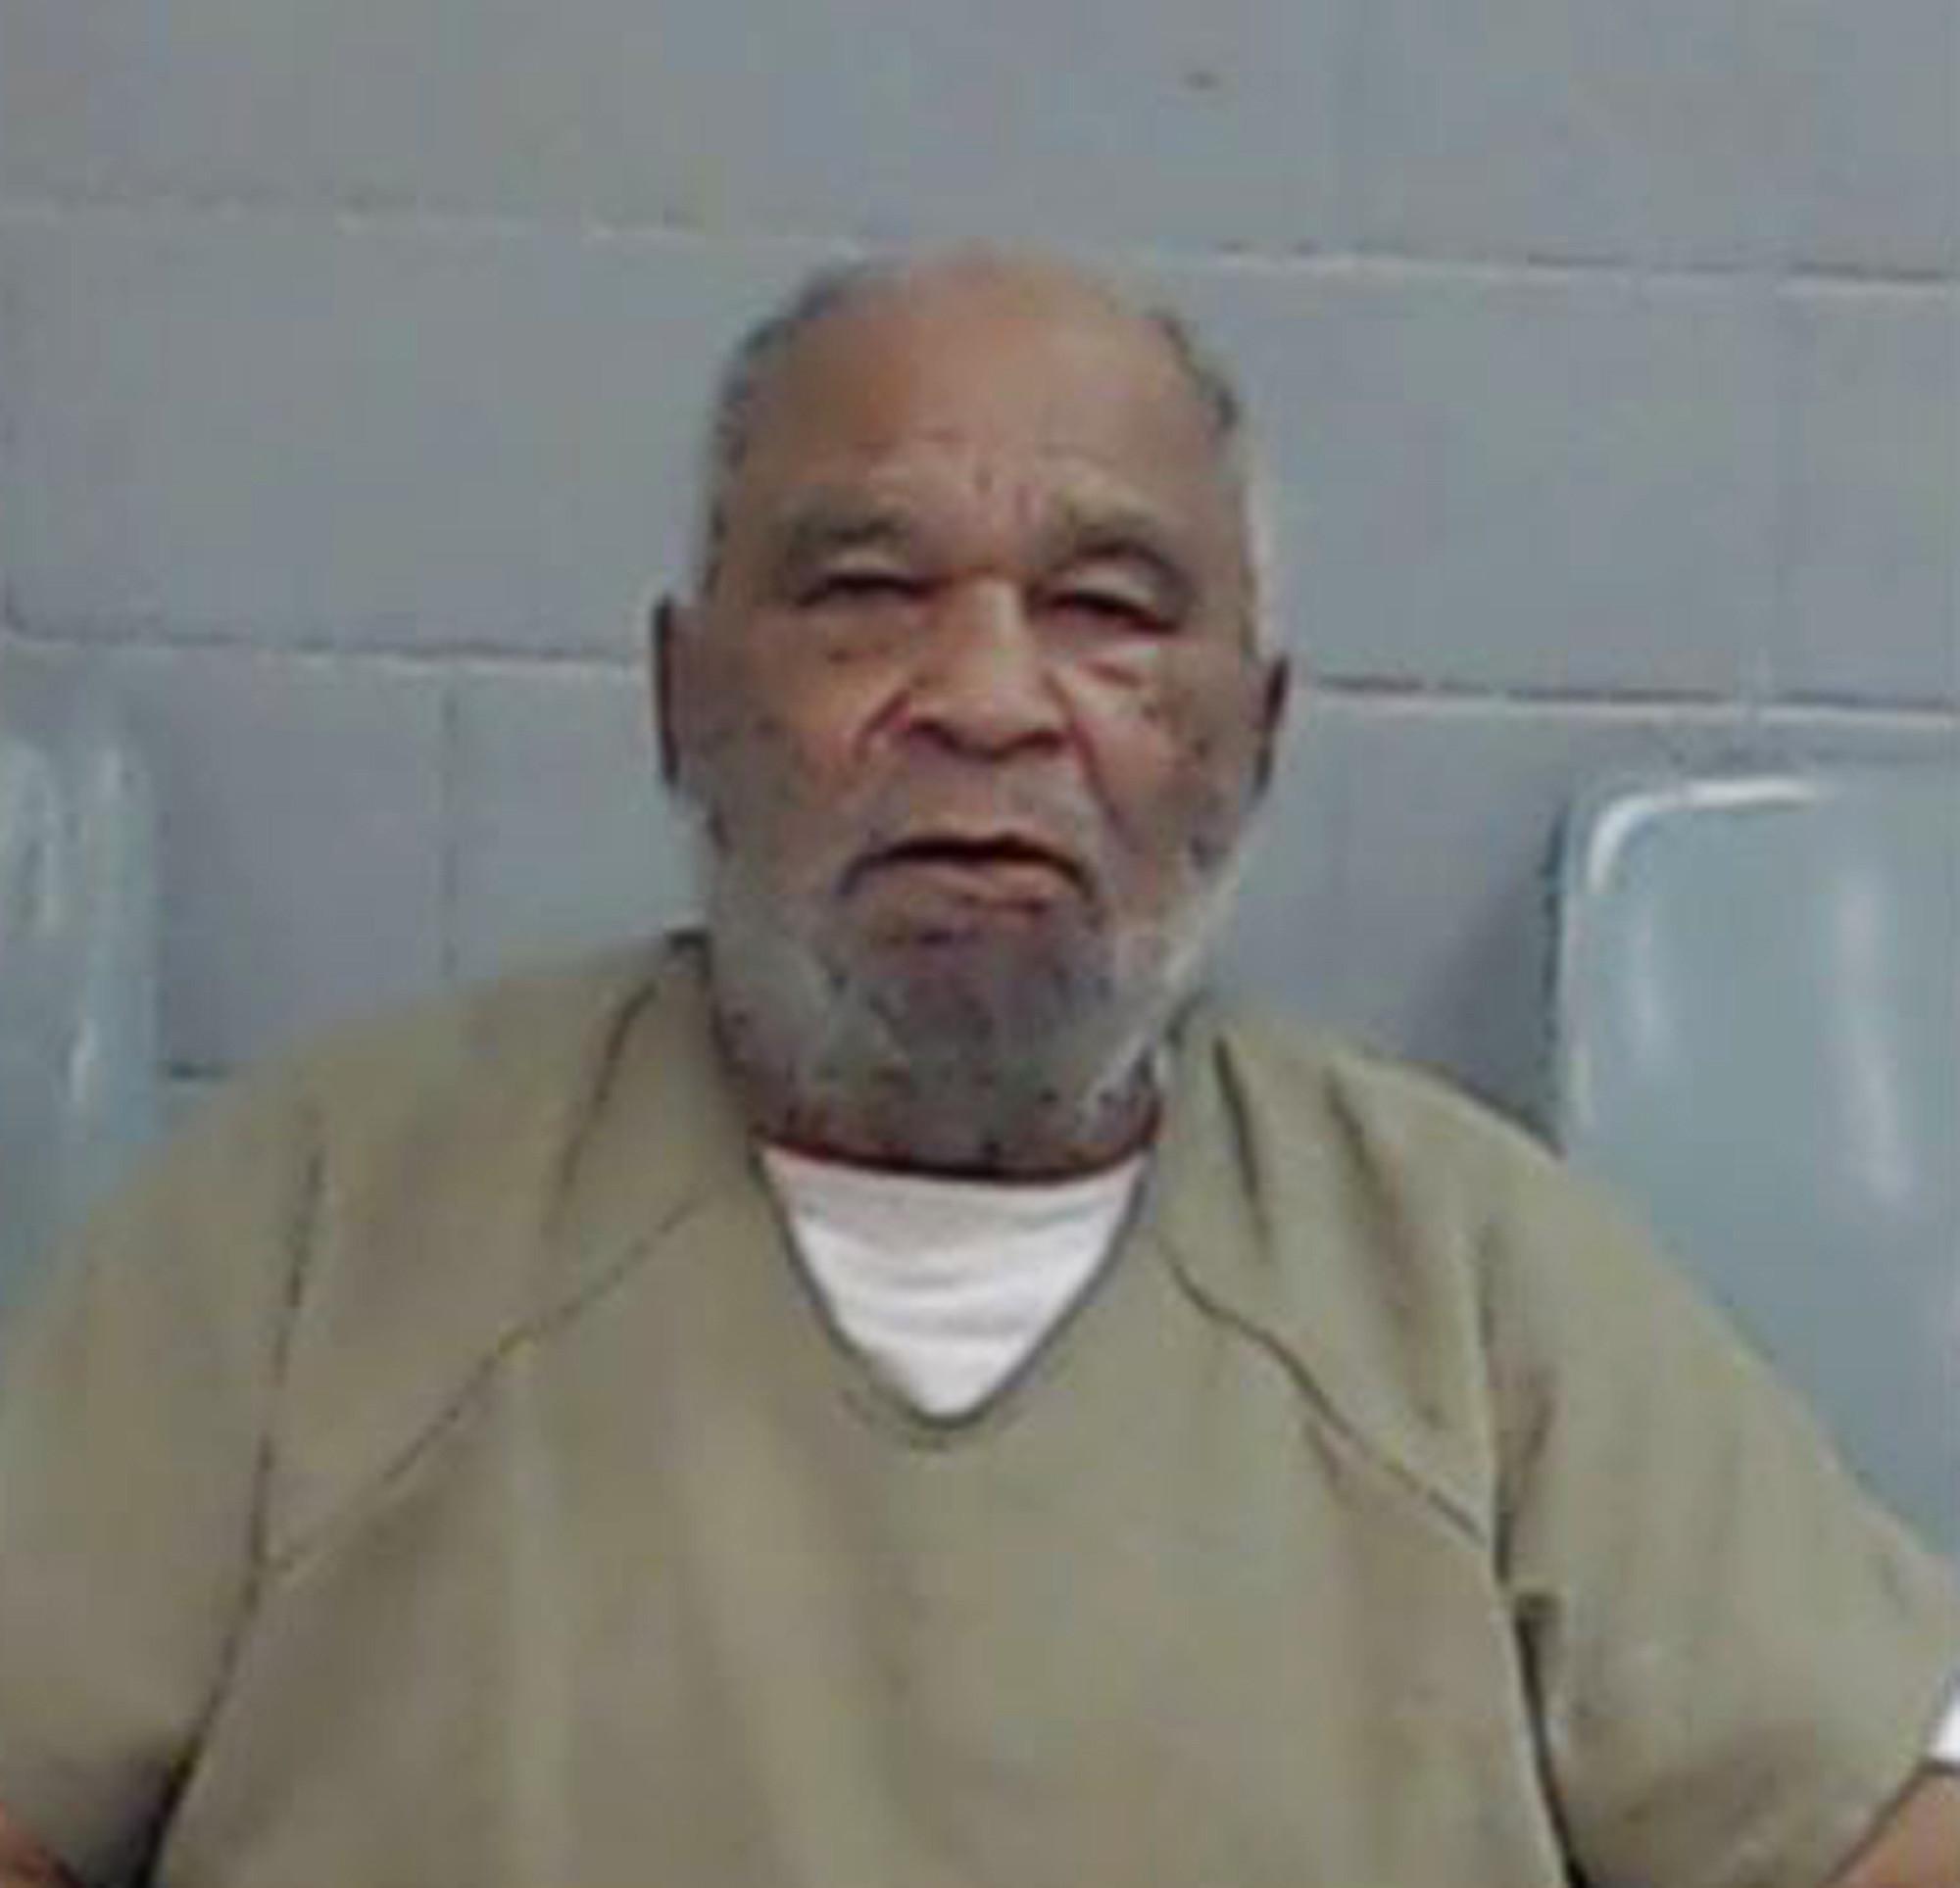 Elderly prisoner claims he's America's deadliest serial killer with 90 victims. Police believe him.